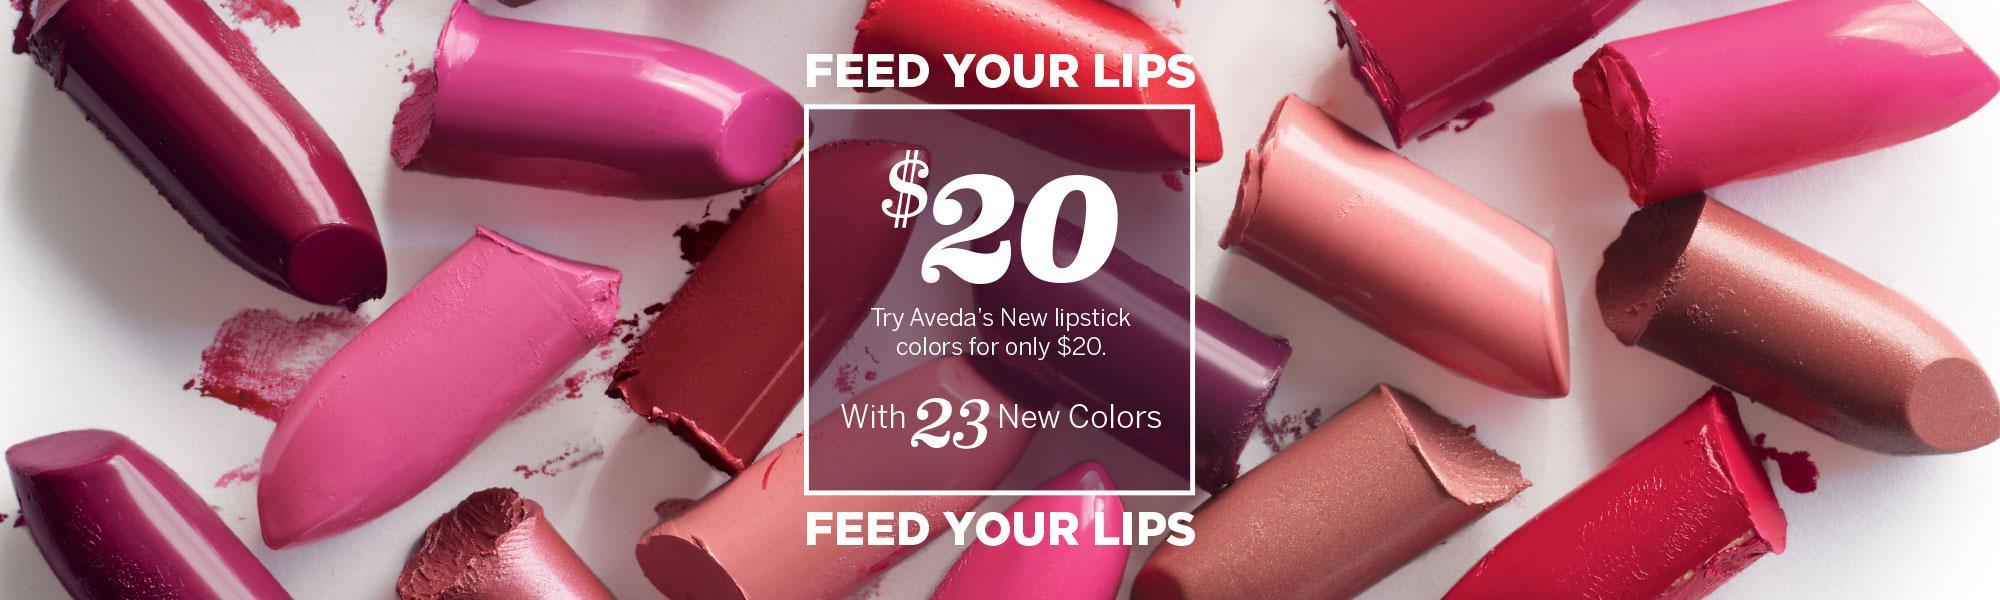 Aveda Lipsticks $20, Feed Your Lips